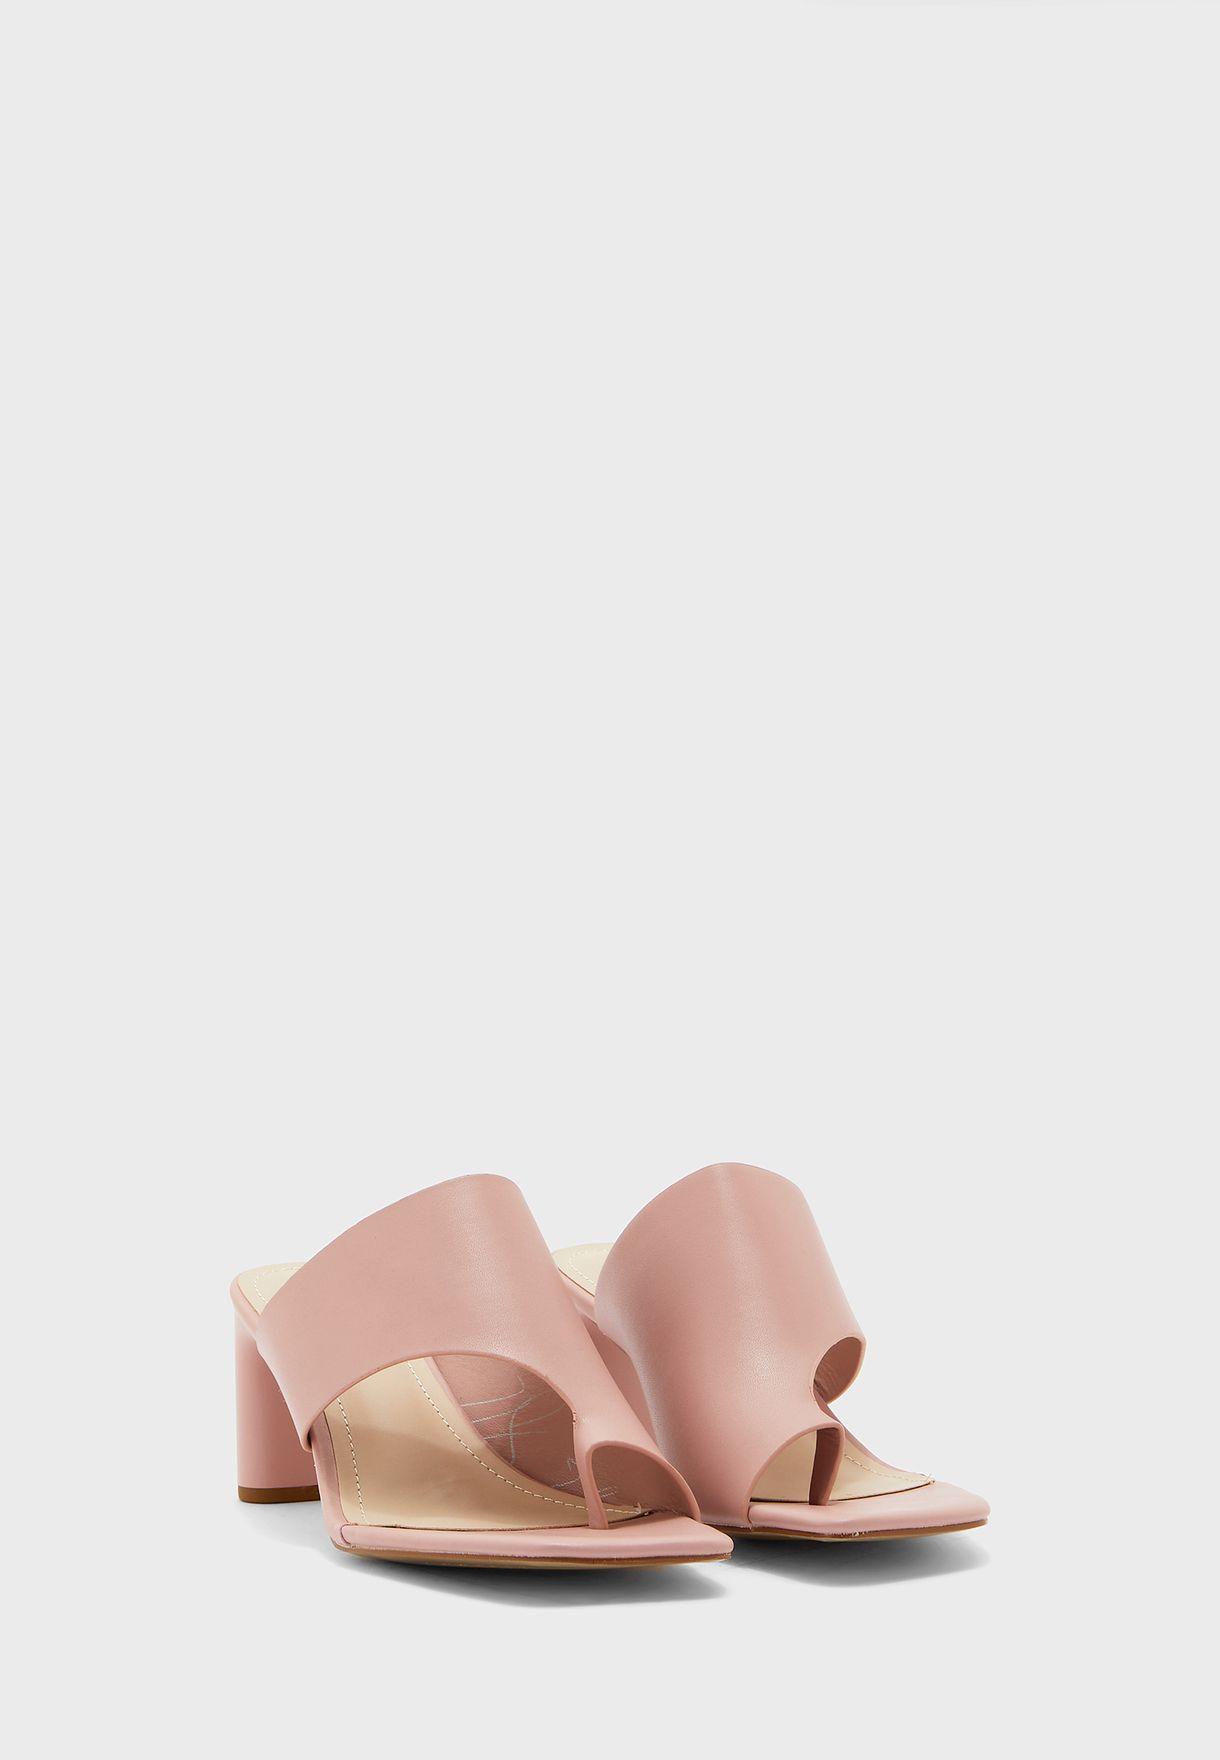 Asymmetric Front Square Toe Mule Sandal